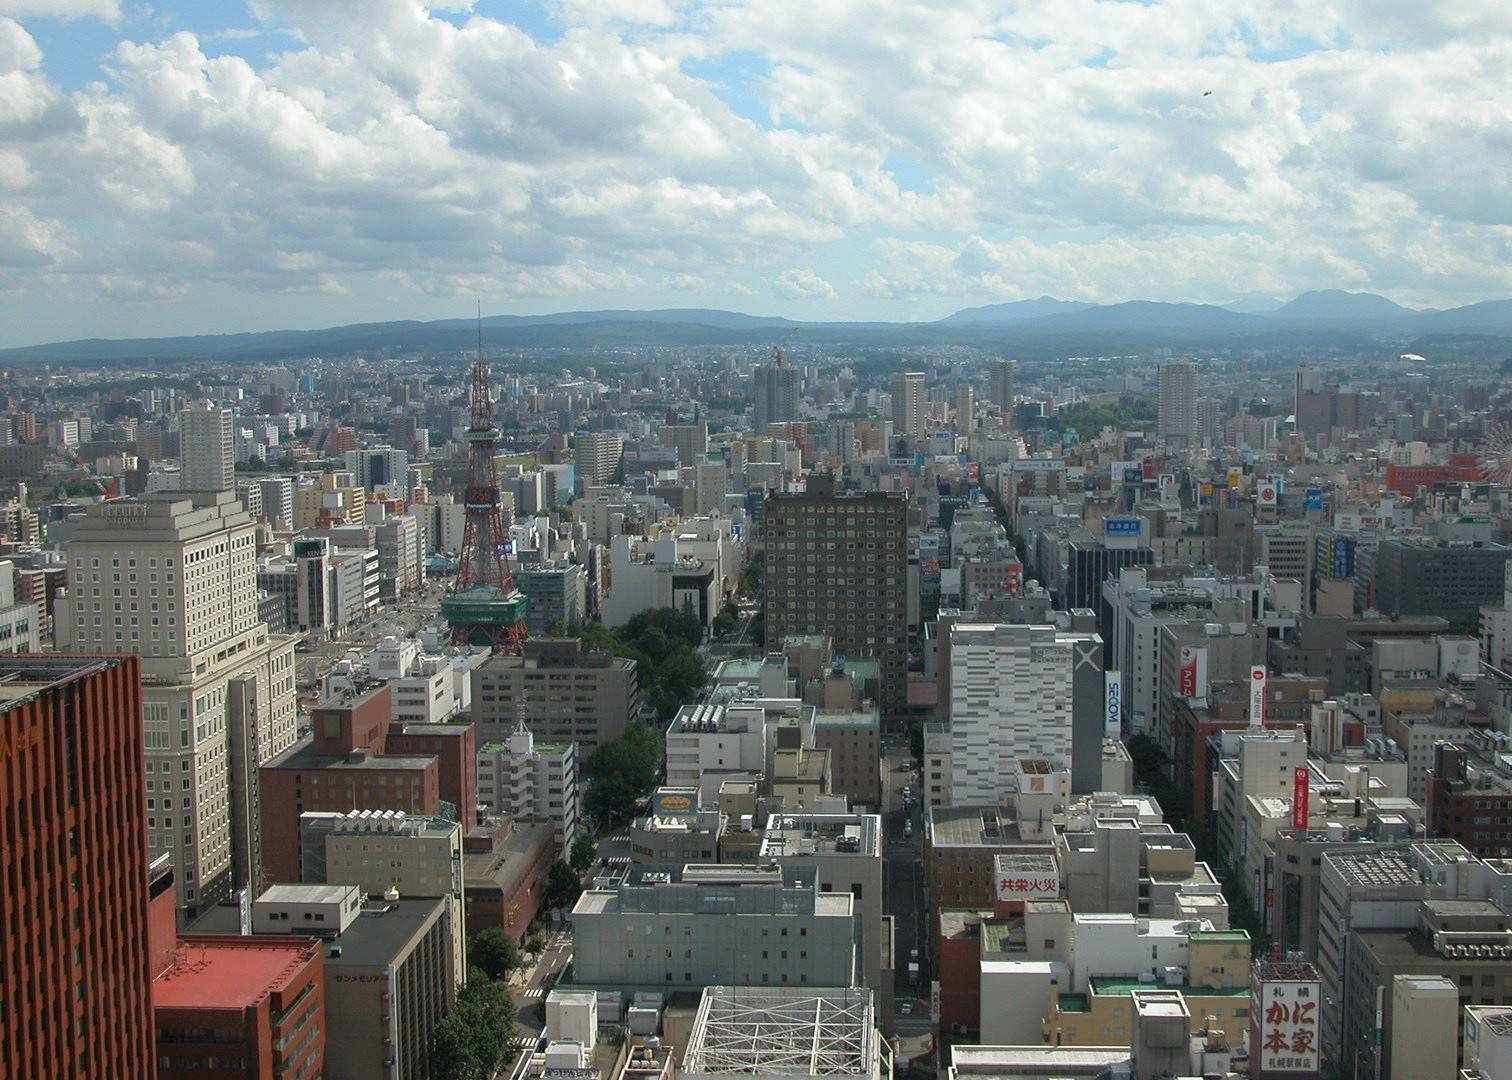 Shizukuishi Prince Hotel - Official website